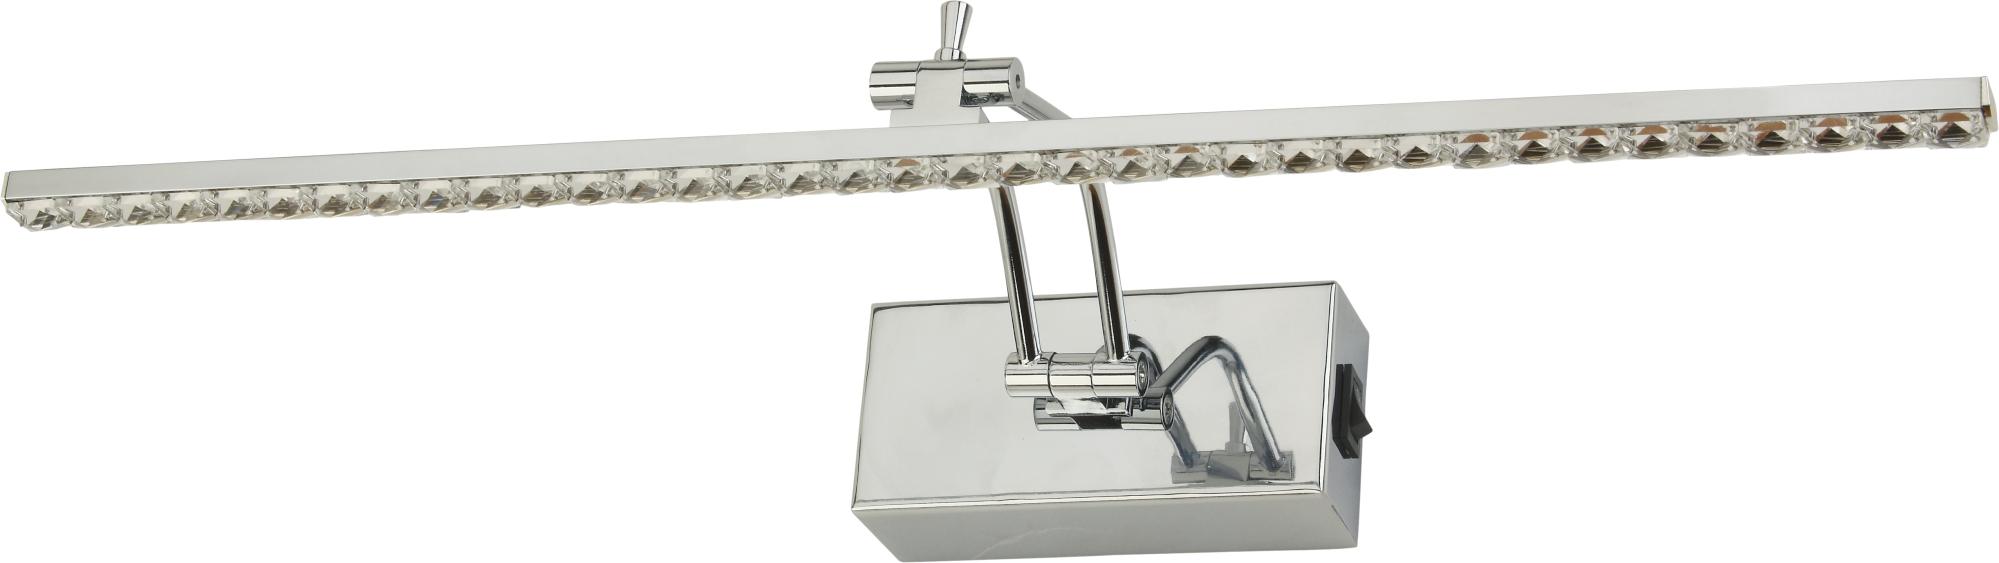 Klausen • Cosmo, fürdőszobai lámpa, KL-6443